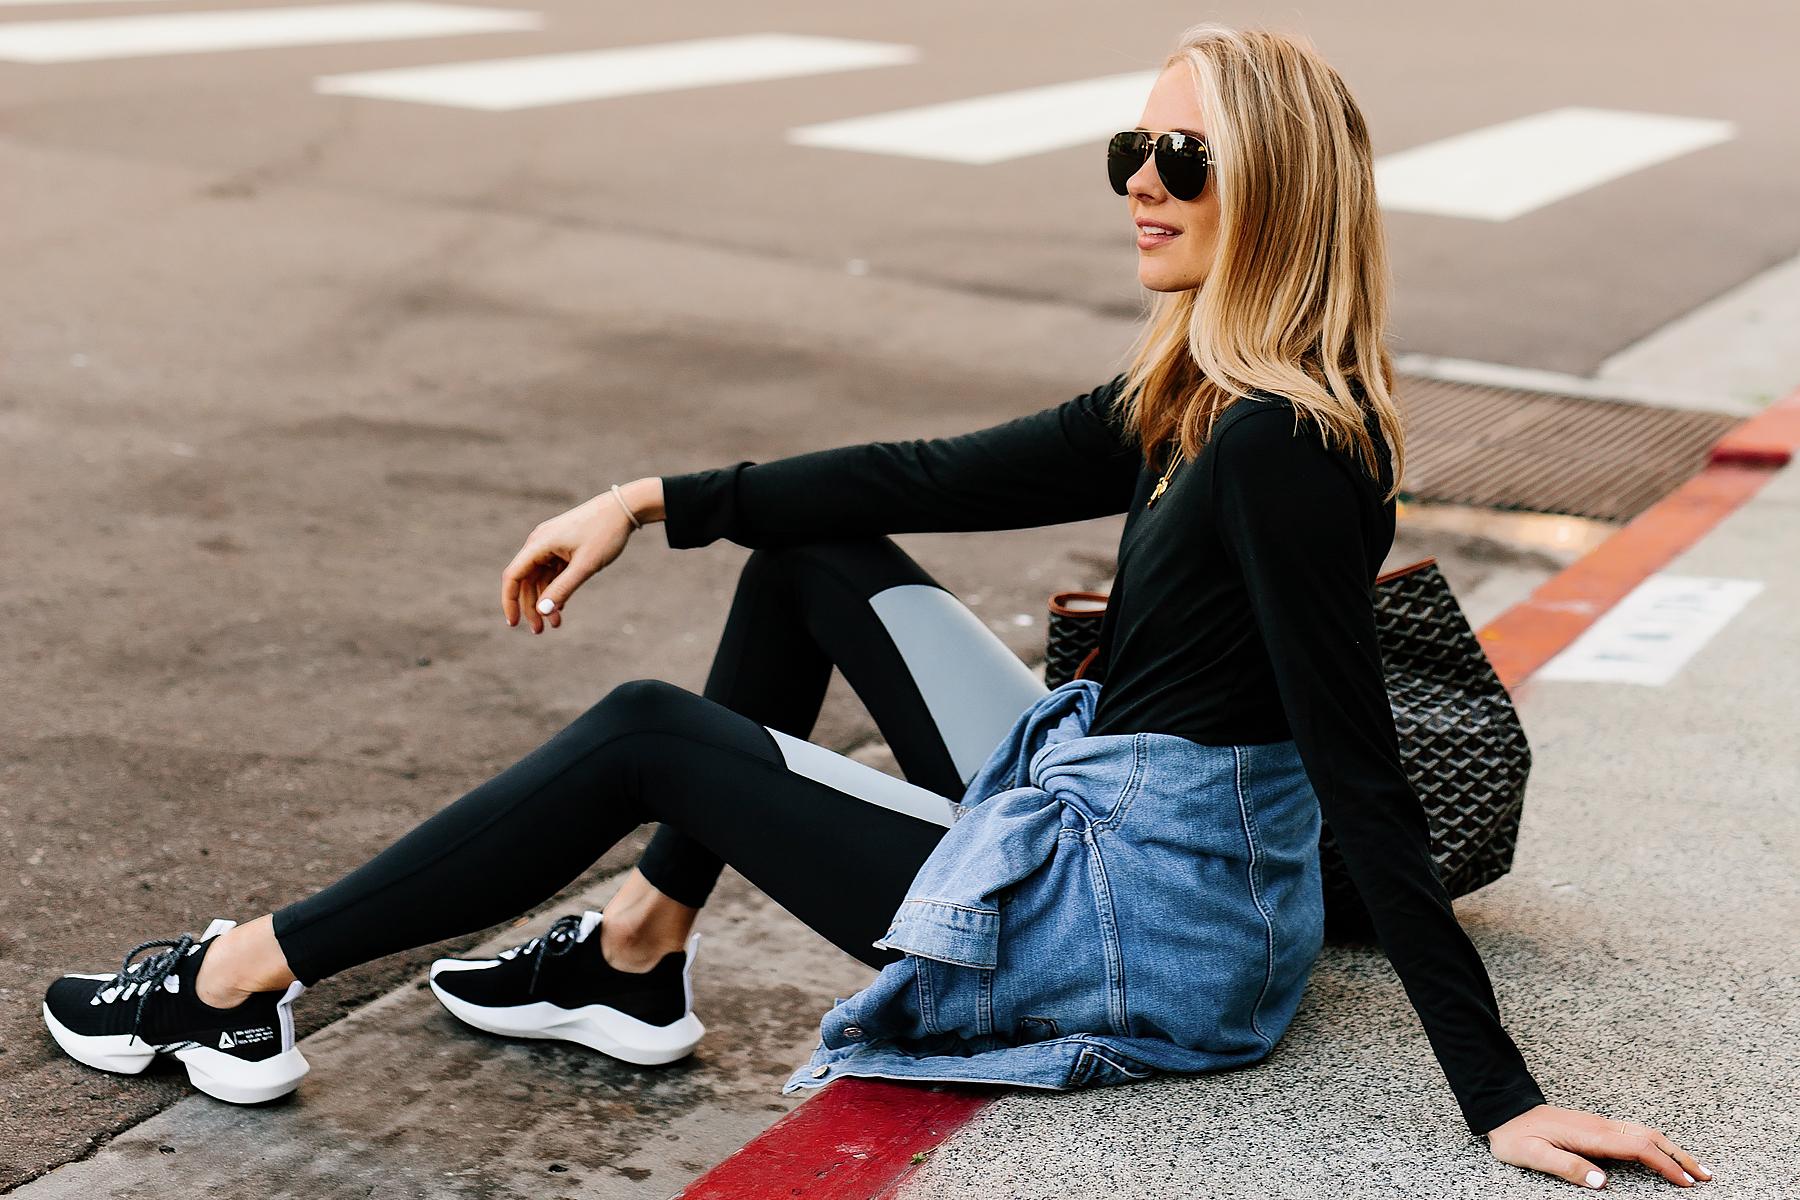 Blonde Woman Wearing Black Long Sleeve Top Denim Jacket Reebok Colorblock Leggings Reebok Sole Fury Black Sneakers Fashion Jackson San Diego Fashion Blogger Athleisure Outfit